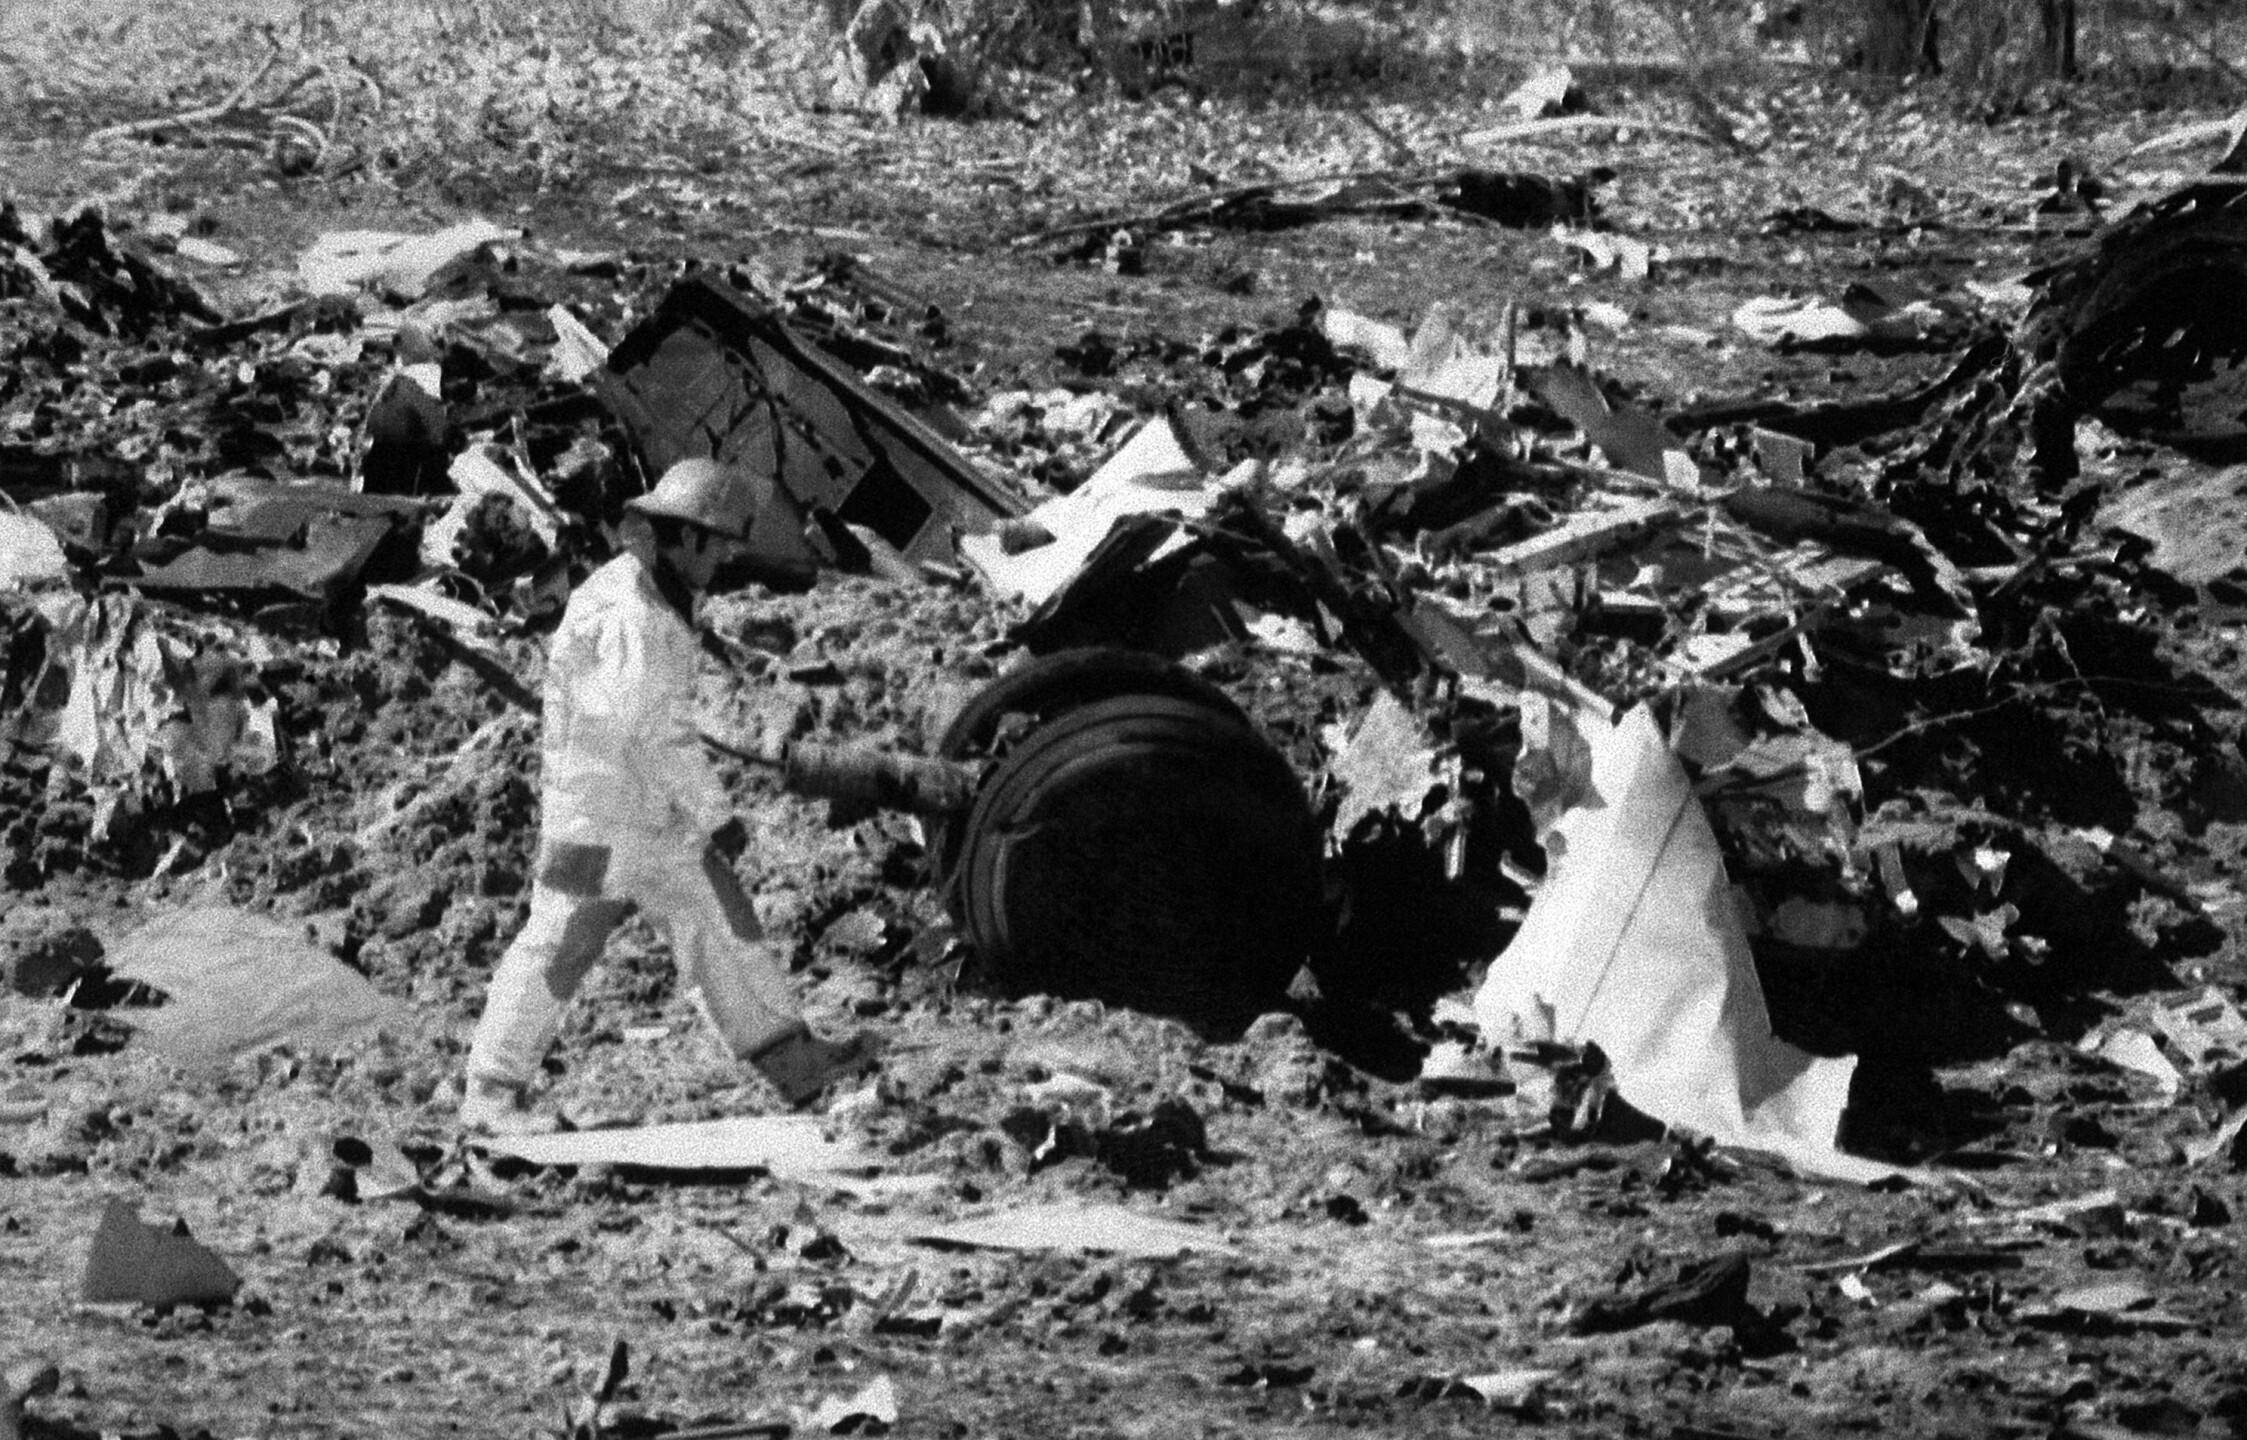 Watchf Associated Press Domestic News  Colorado United States APHS49677 FATAL PLANE CRASH SCENE